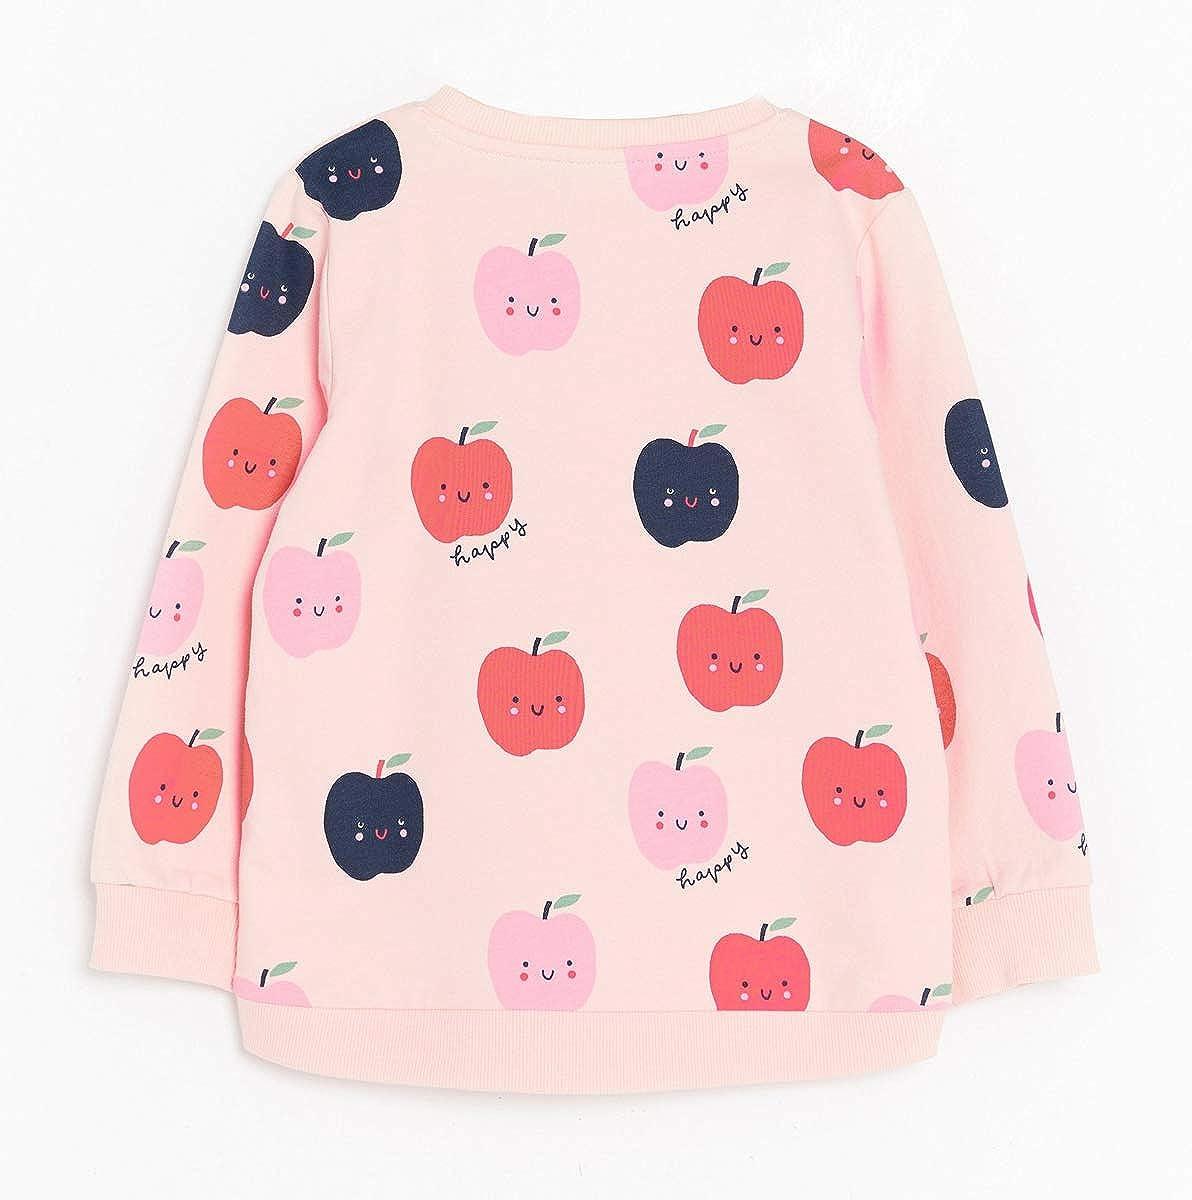 Youlebao Little Girl Cotton Long Sleeved Cute Cartoon Pullover Sweatshirt